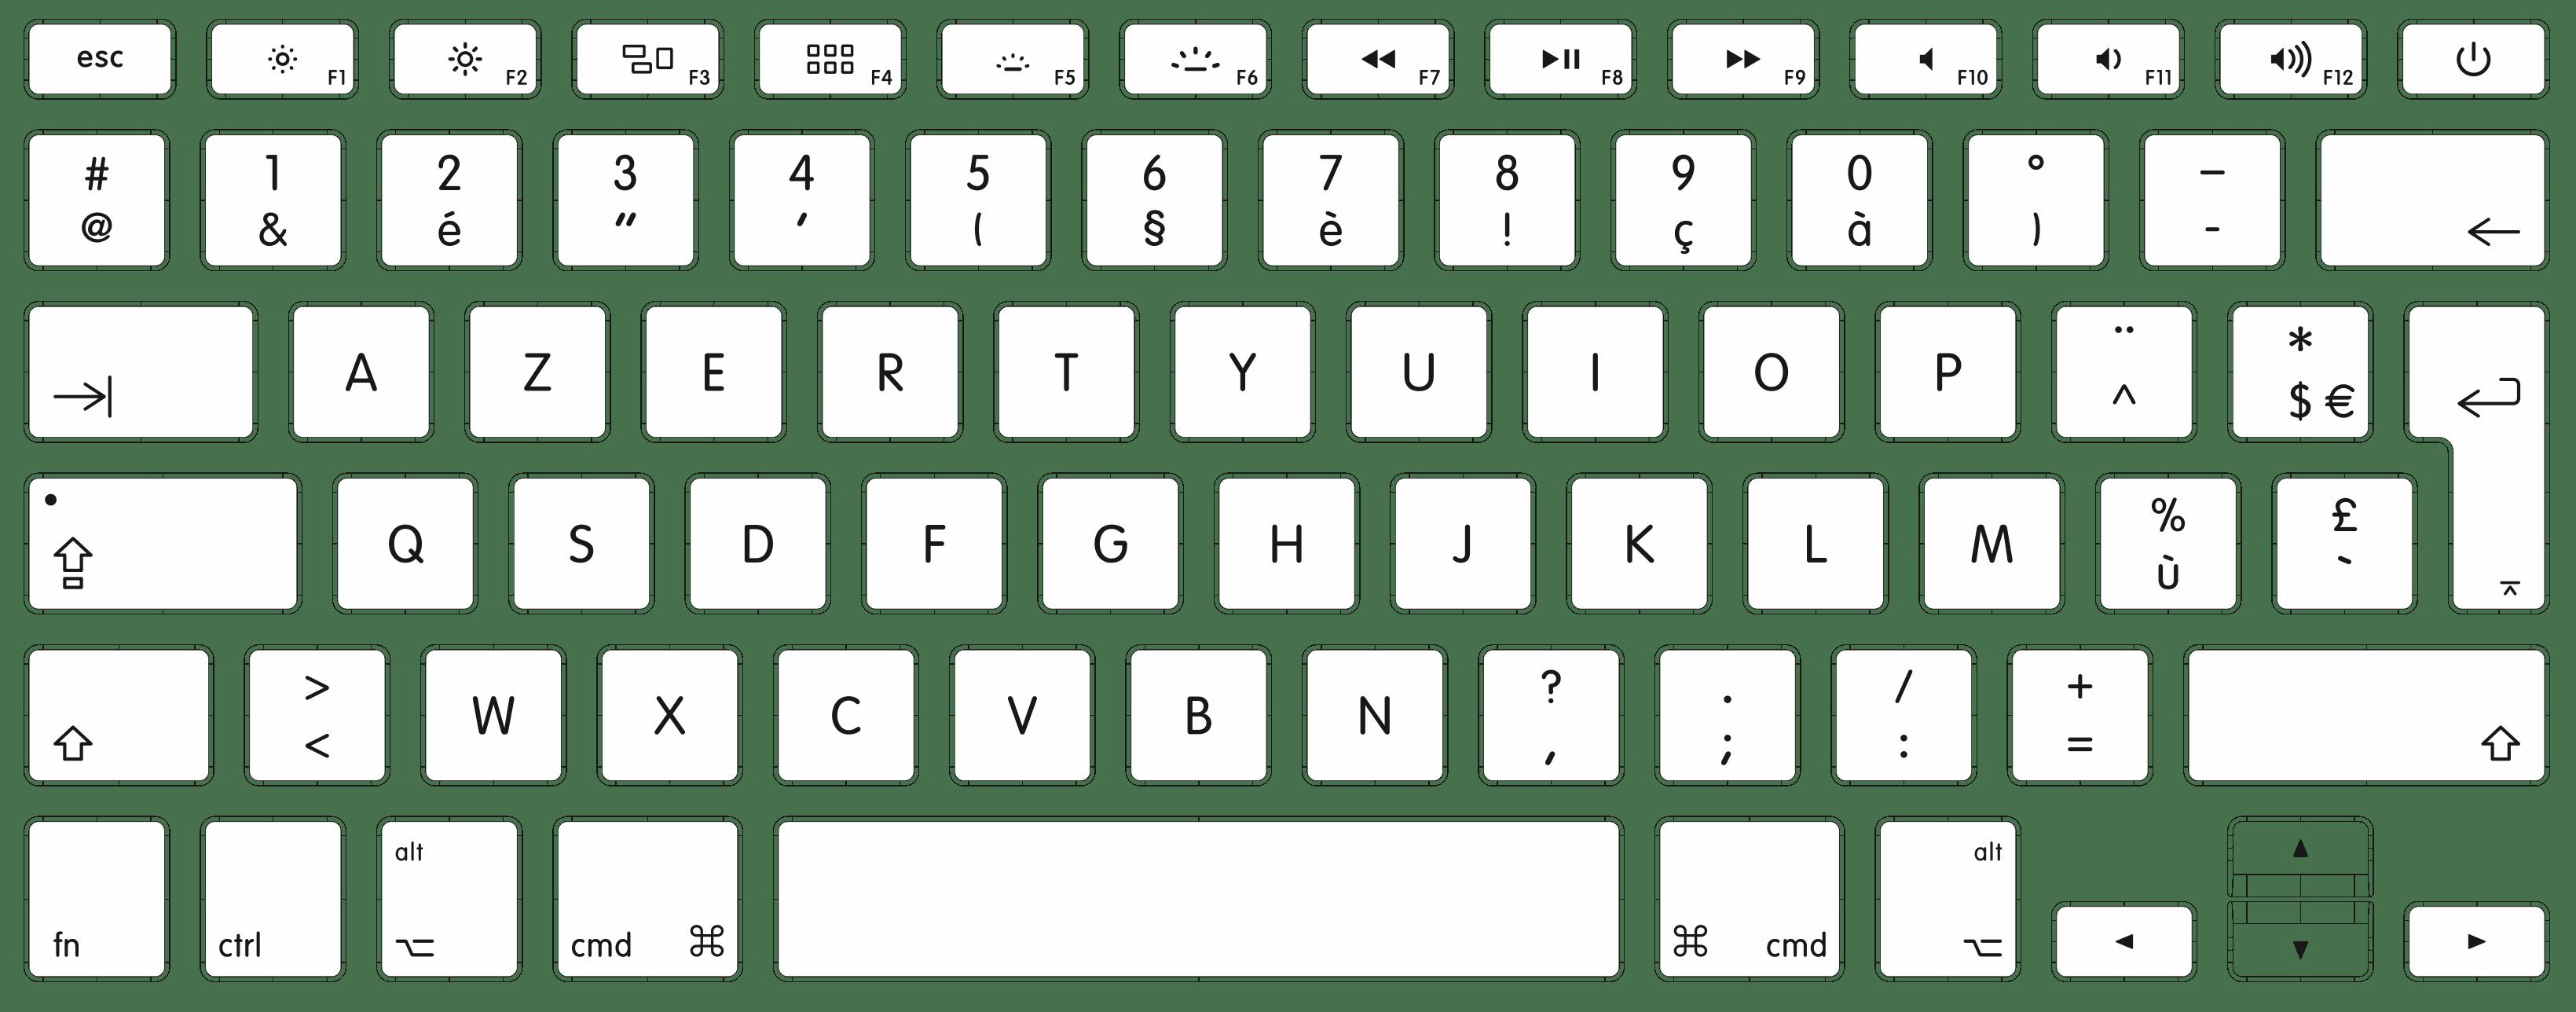 Right Alt Or Cmd Key To Emulate Alt Ctrl Altgr Feedback For Microsoft Remote Desktop